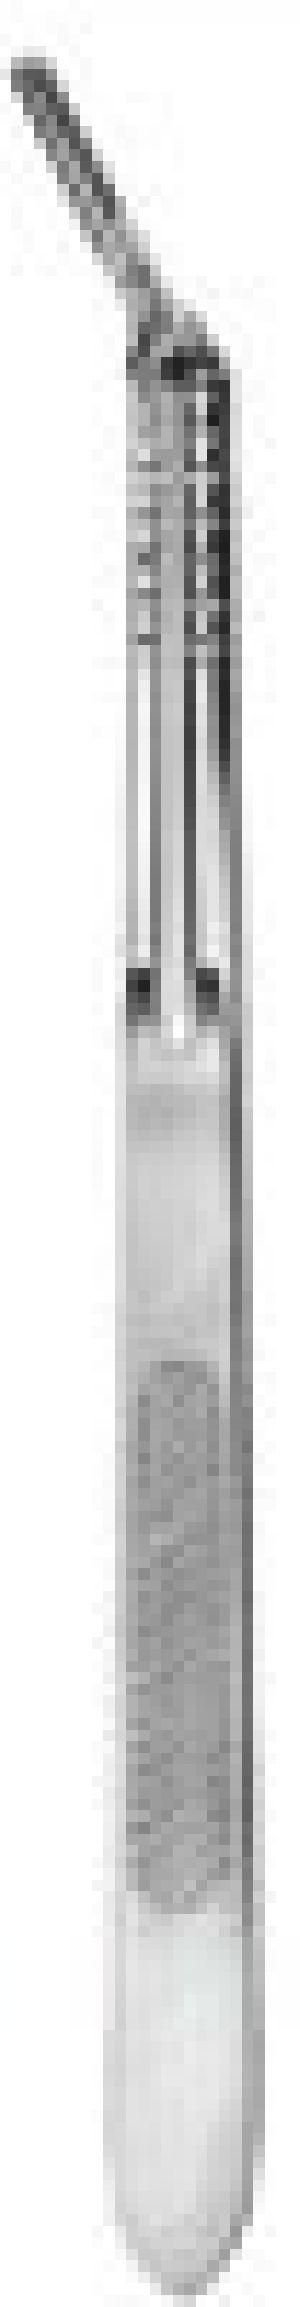 MI-5-111-45 Surgical Scalpel